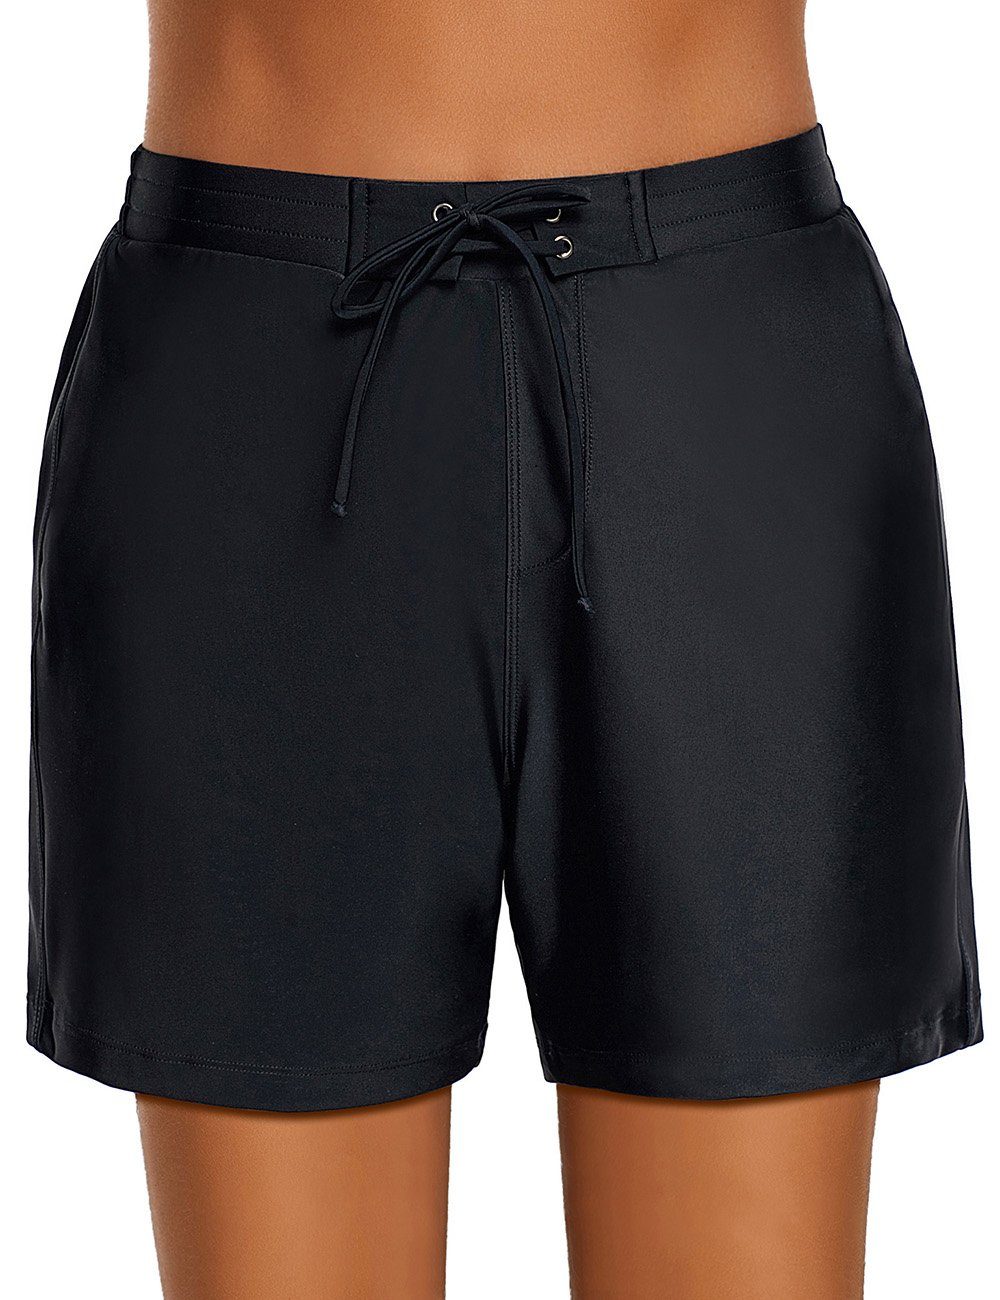 Utyful Women's Black Casual Lace up Elastic Waist Swimsuit Bottom Beach Board Shorts Size L